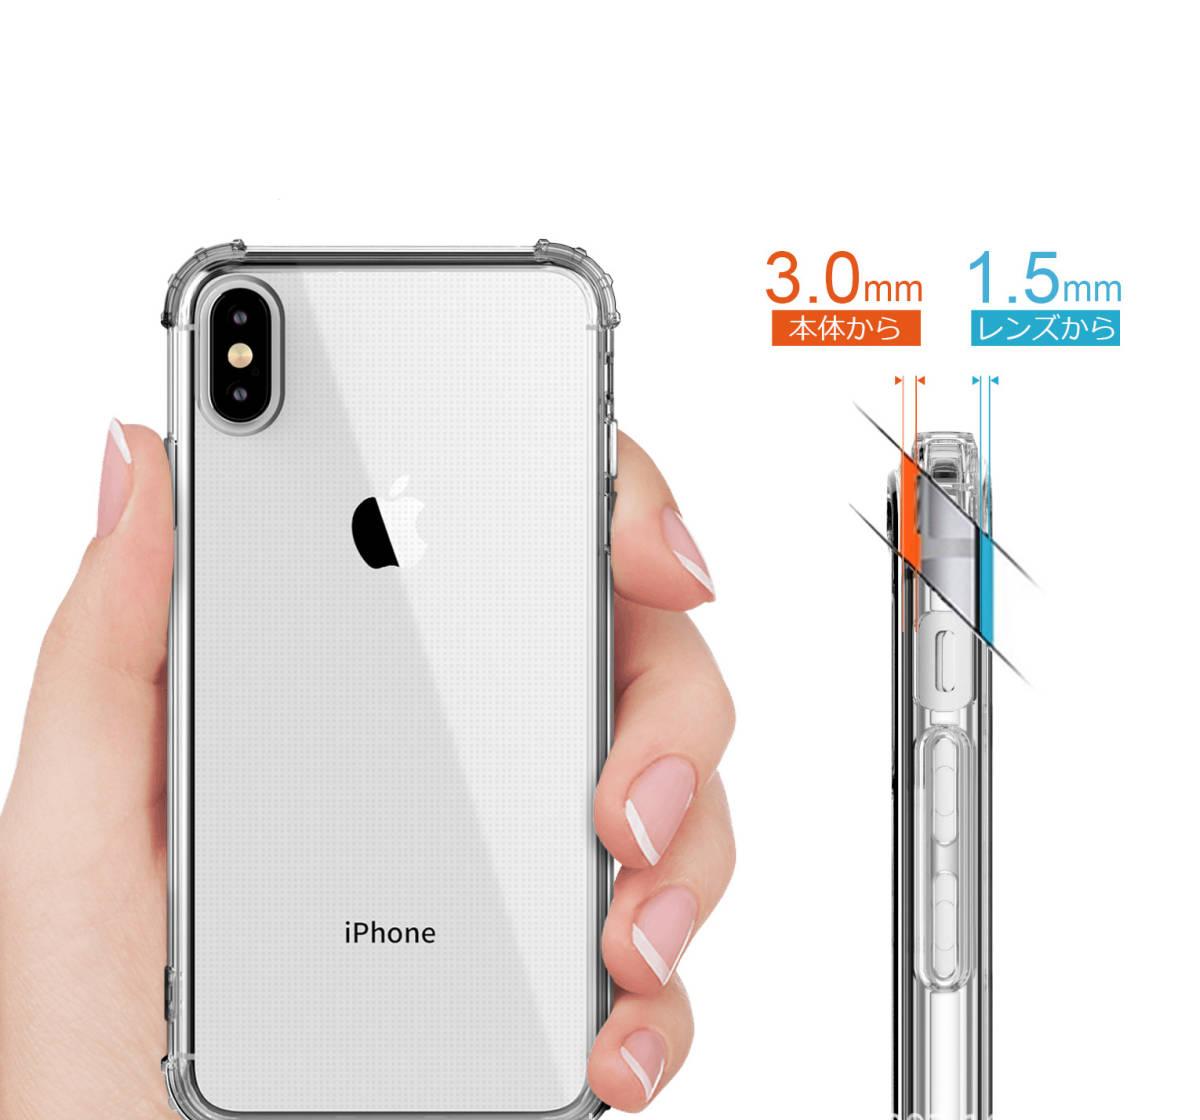 iPhone XS Max TPUケース透明ソフトクリアケース TPU 耐衝撃 衝撃吸収 ストラップホール付き 全面保護カバー 傷つけ防止_画像6